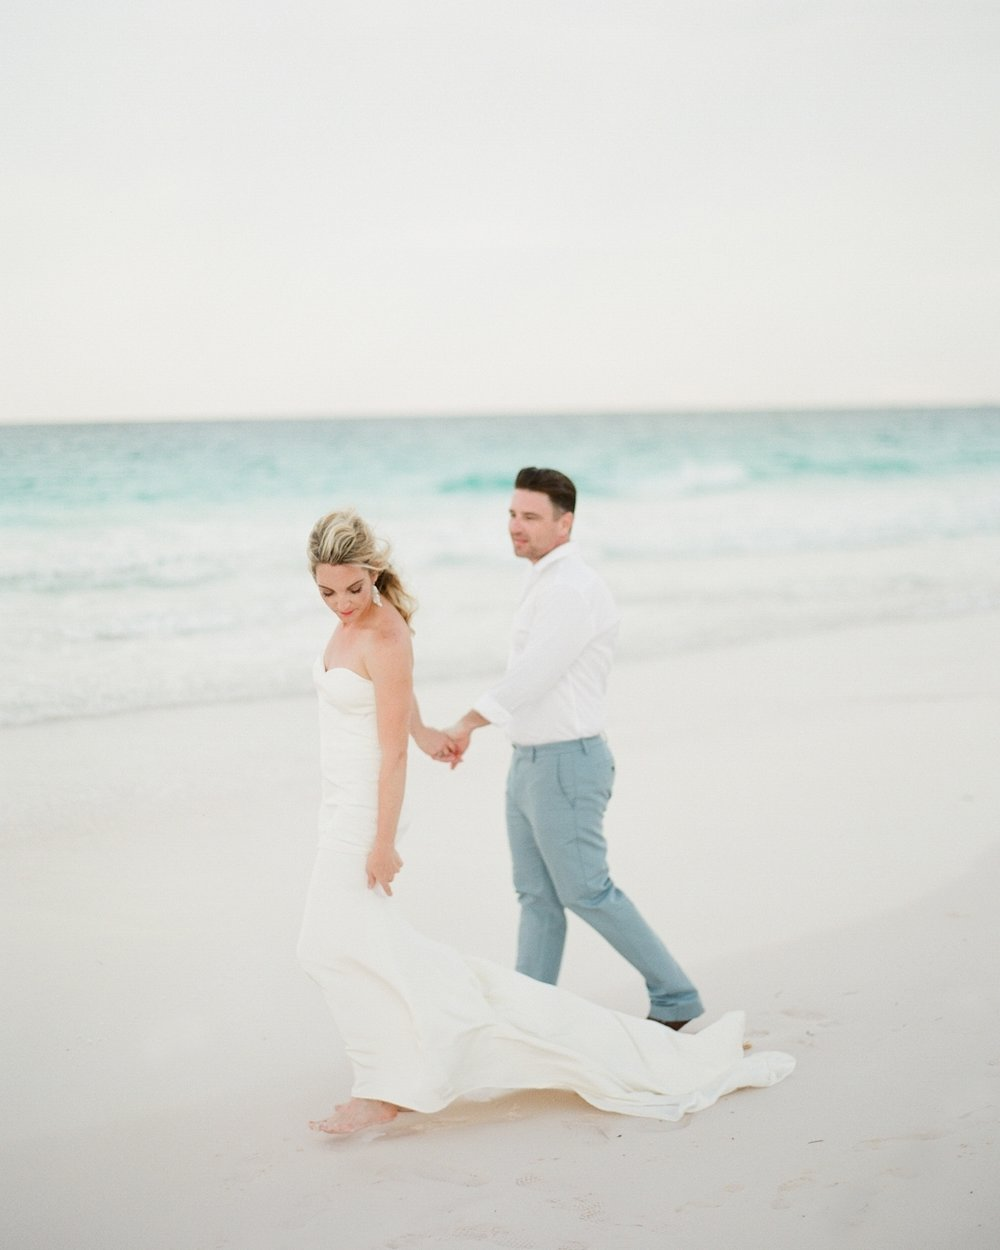 Daniel & Kate - HARBOUR ISLAND BAHAMAS- WEDDING